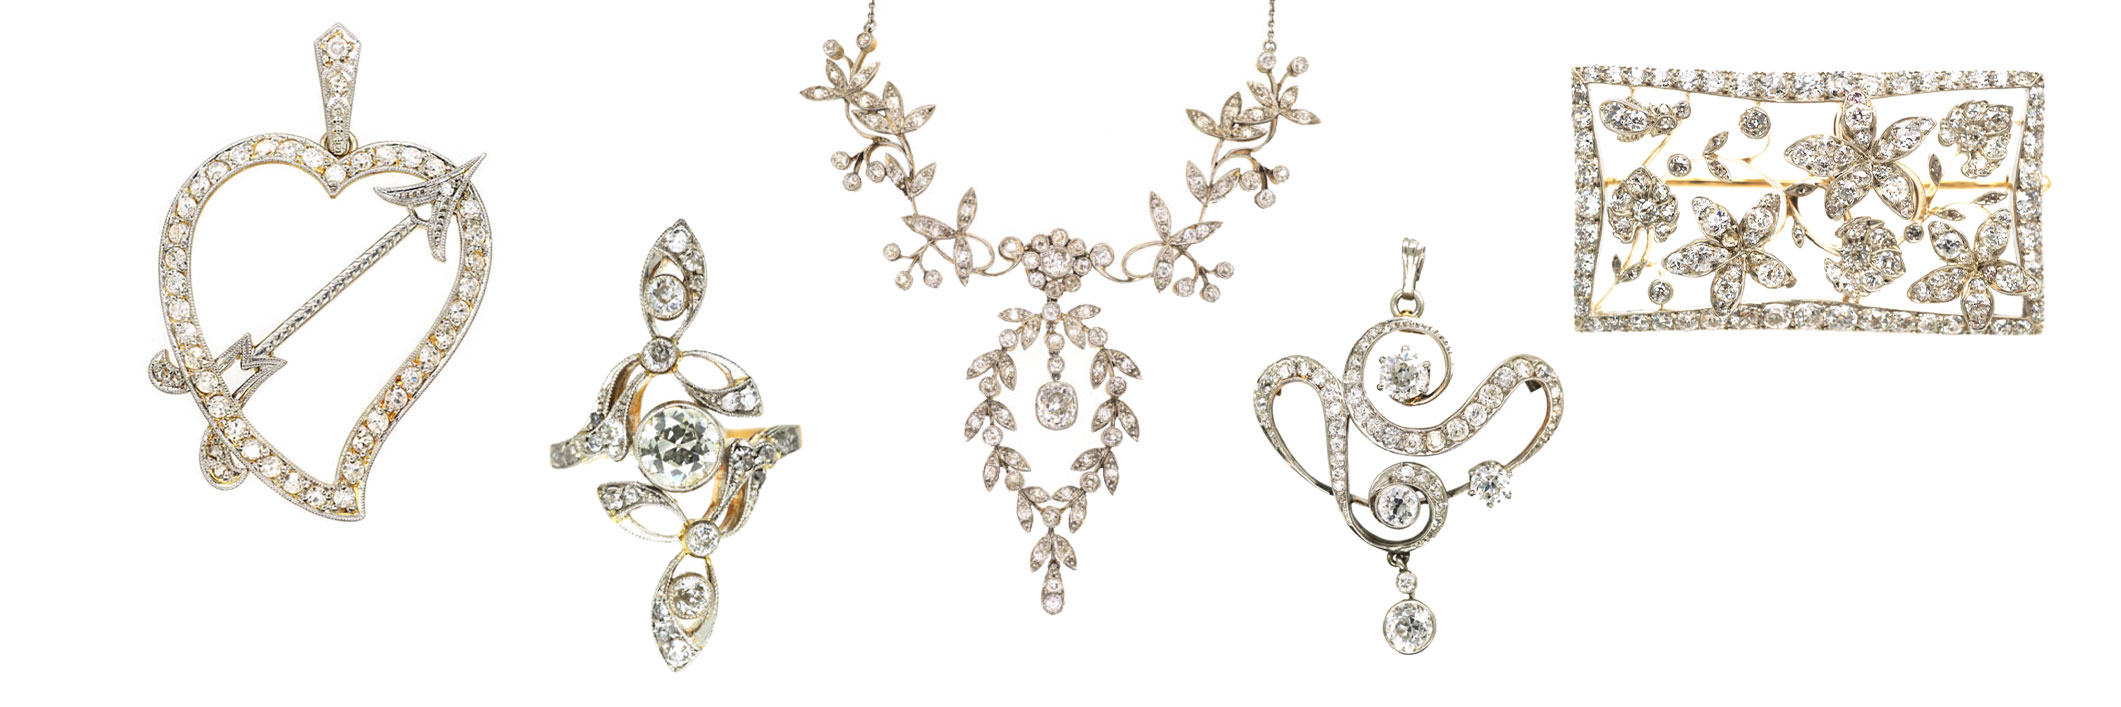 Edwardian filigree jewellery